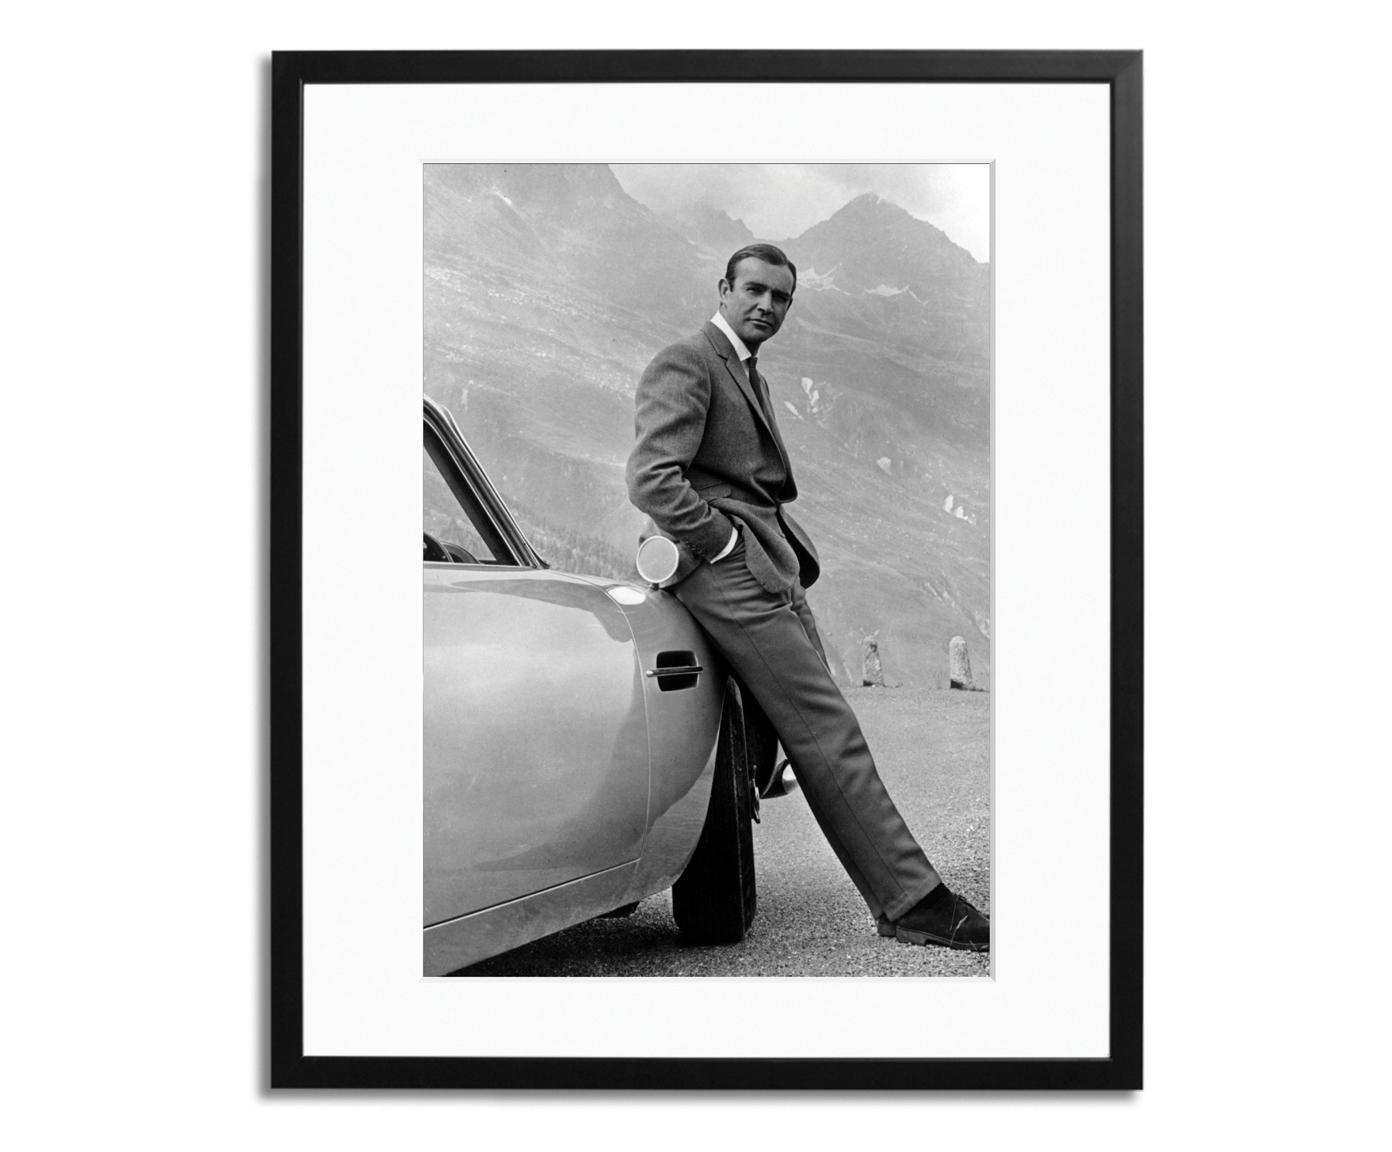 Ingelijste fotoprint Connery, Afbeelding: Fuji Crystal Archive-papi, Lijst: plexiglas, gelakt hout, Zwart, wit, 40 x 50 cm